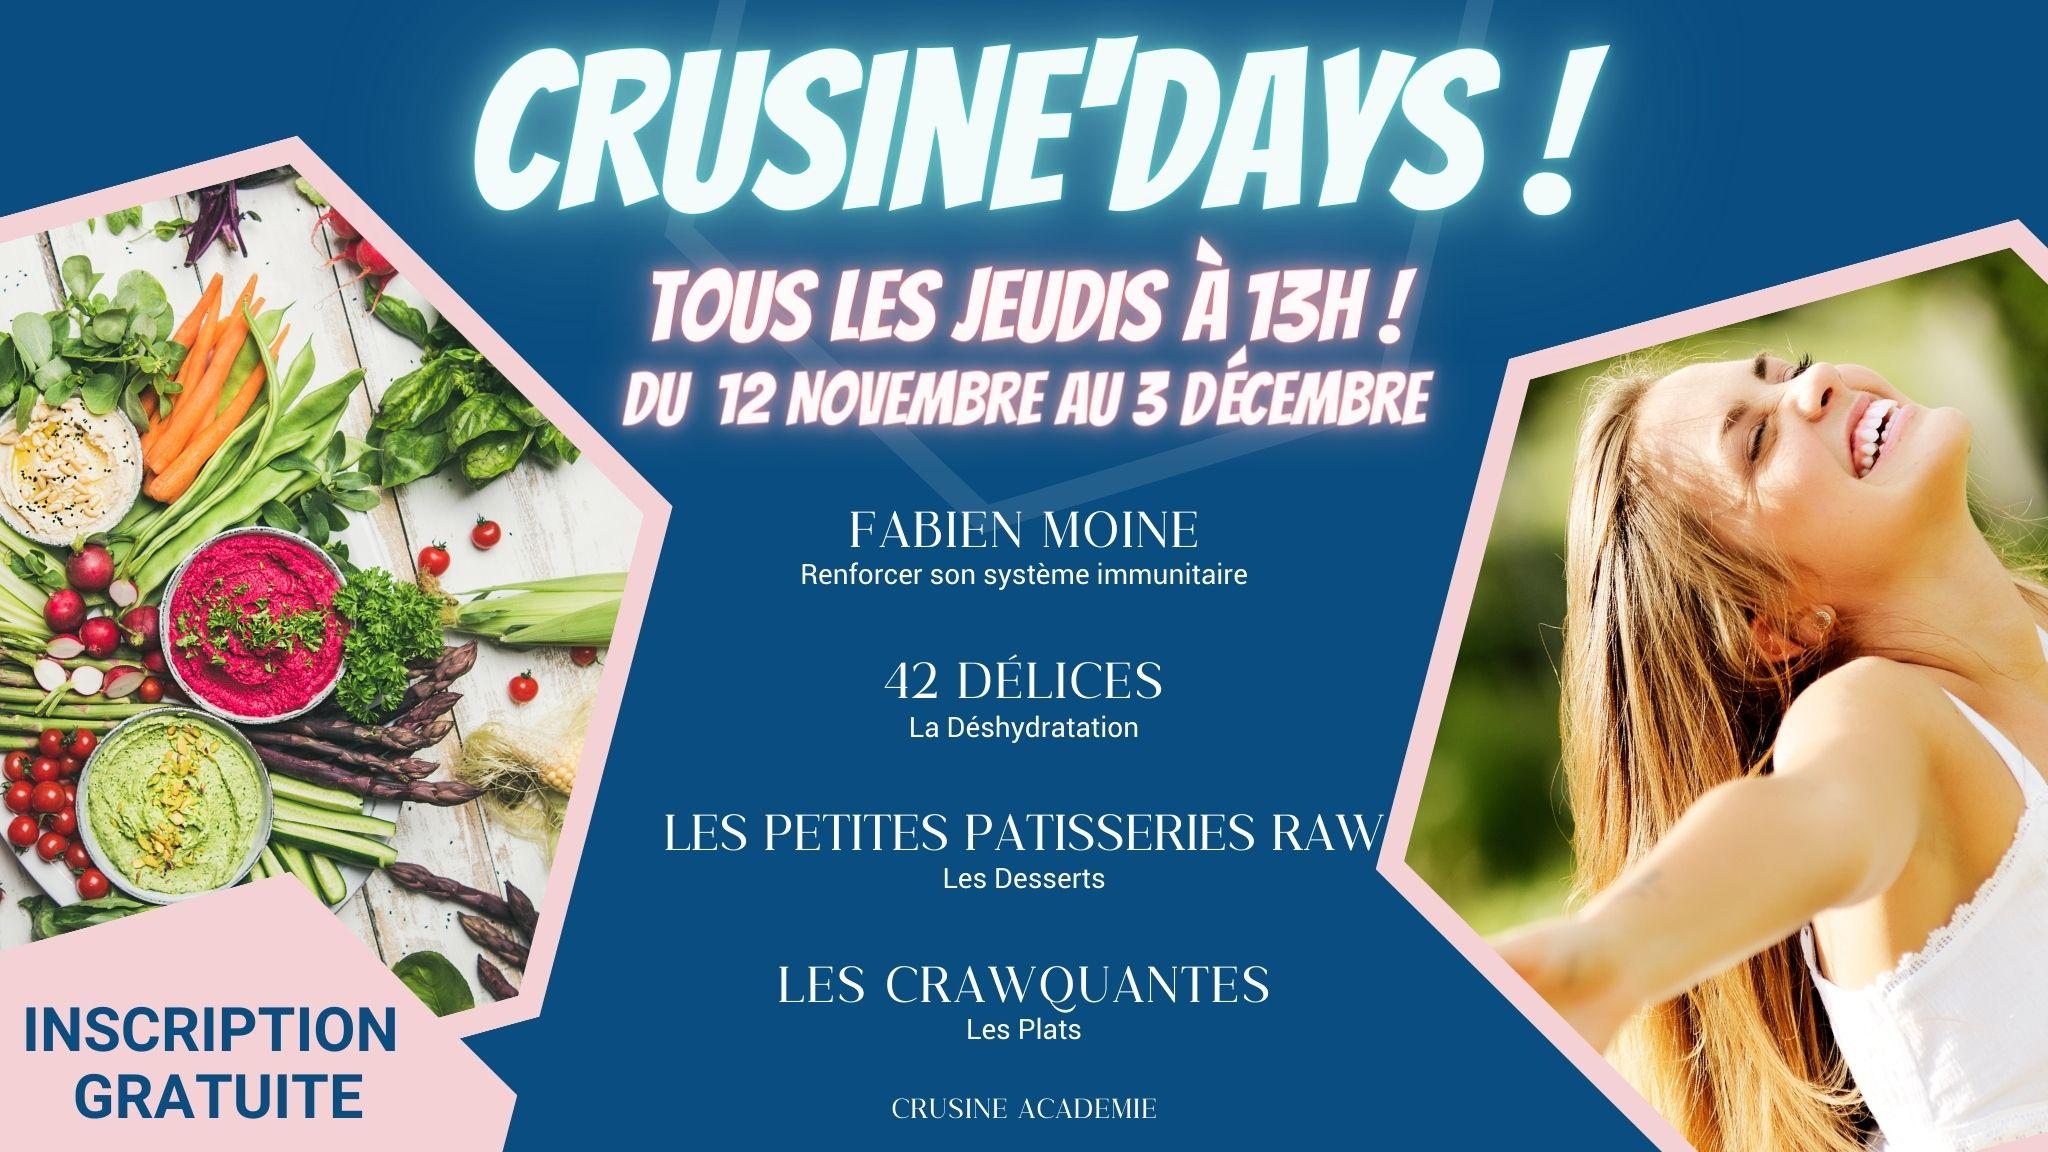 Crusine Days